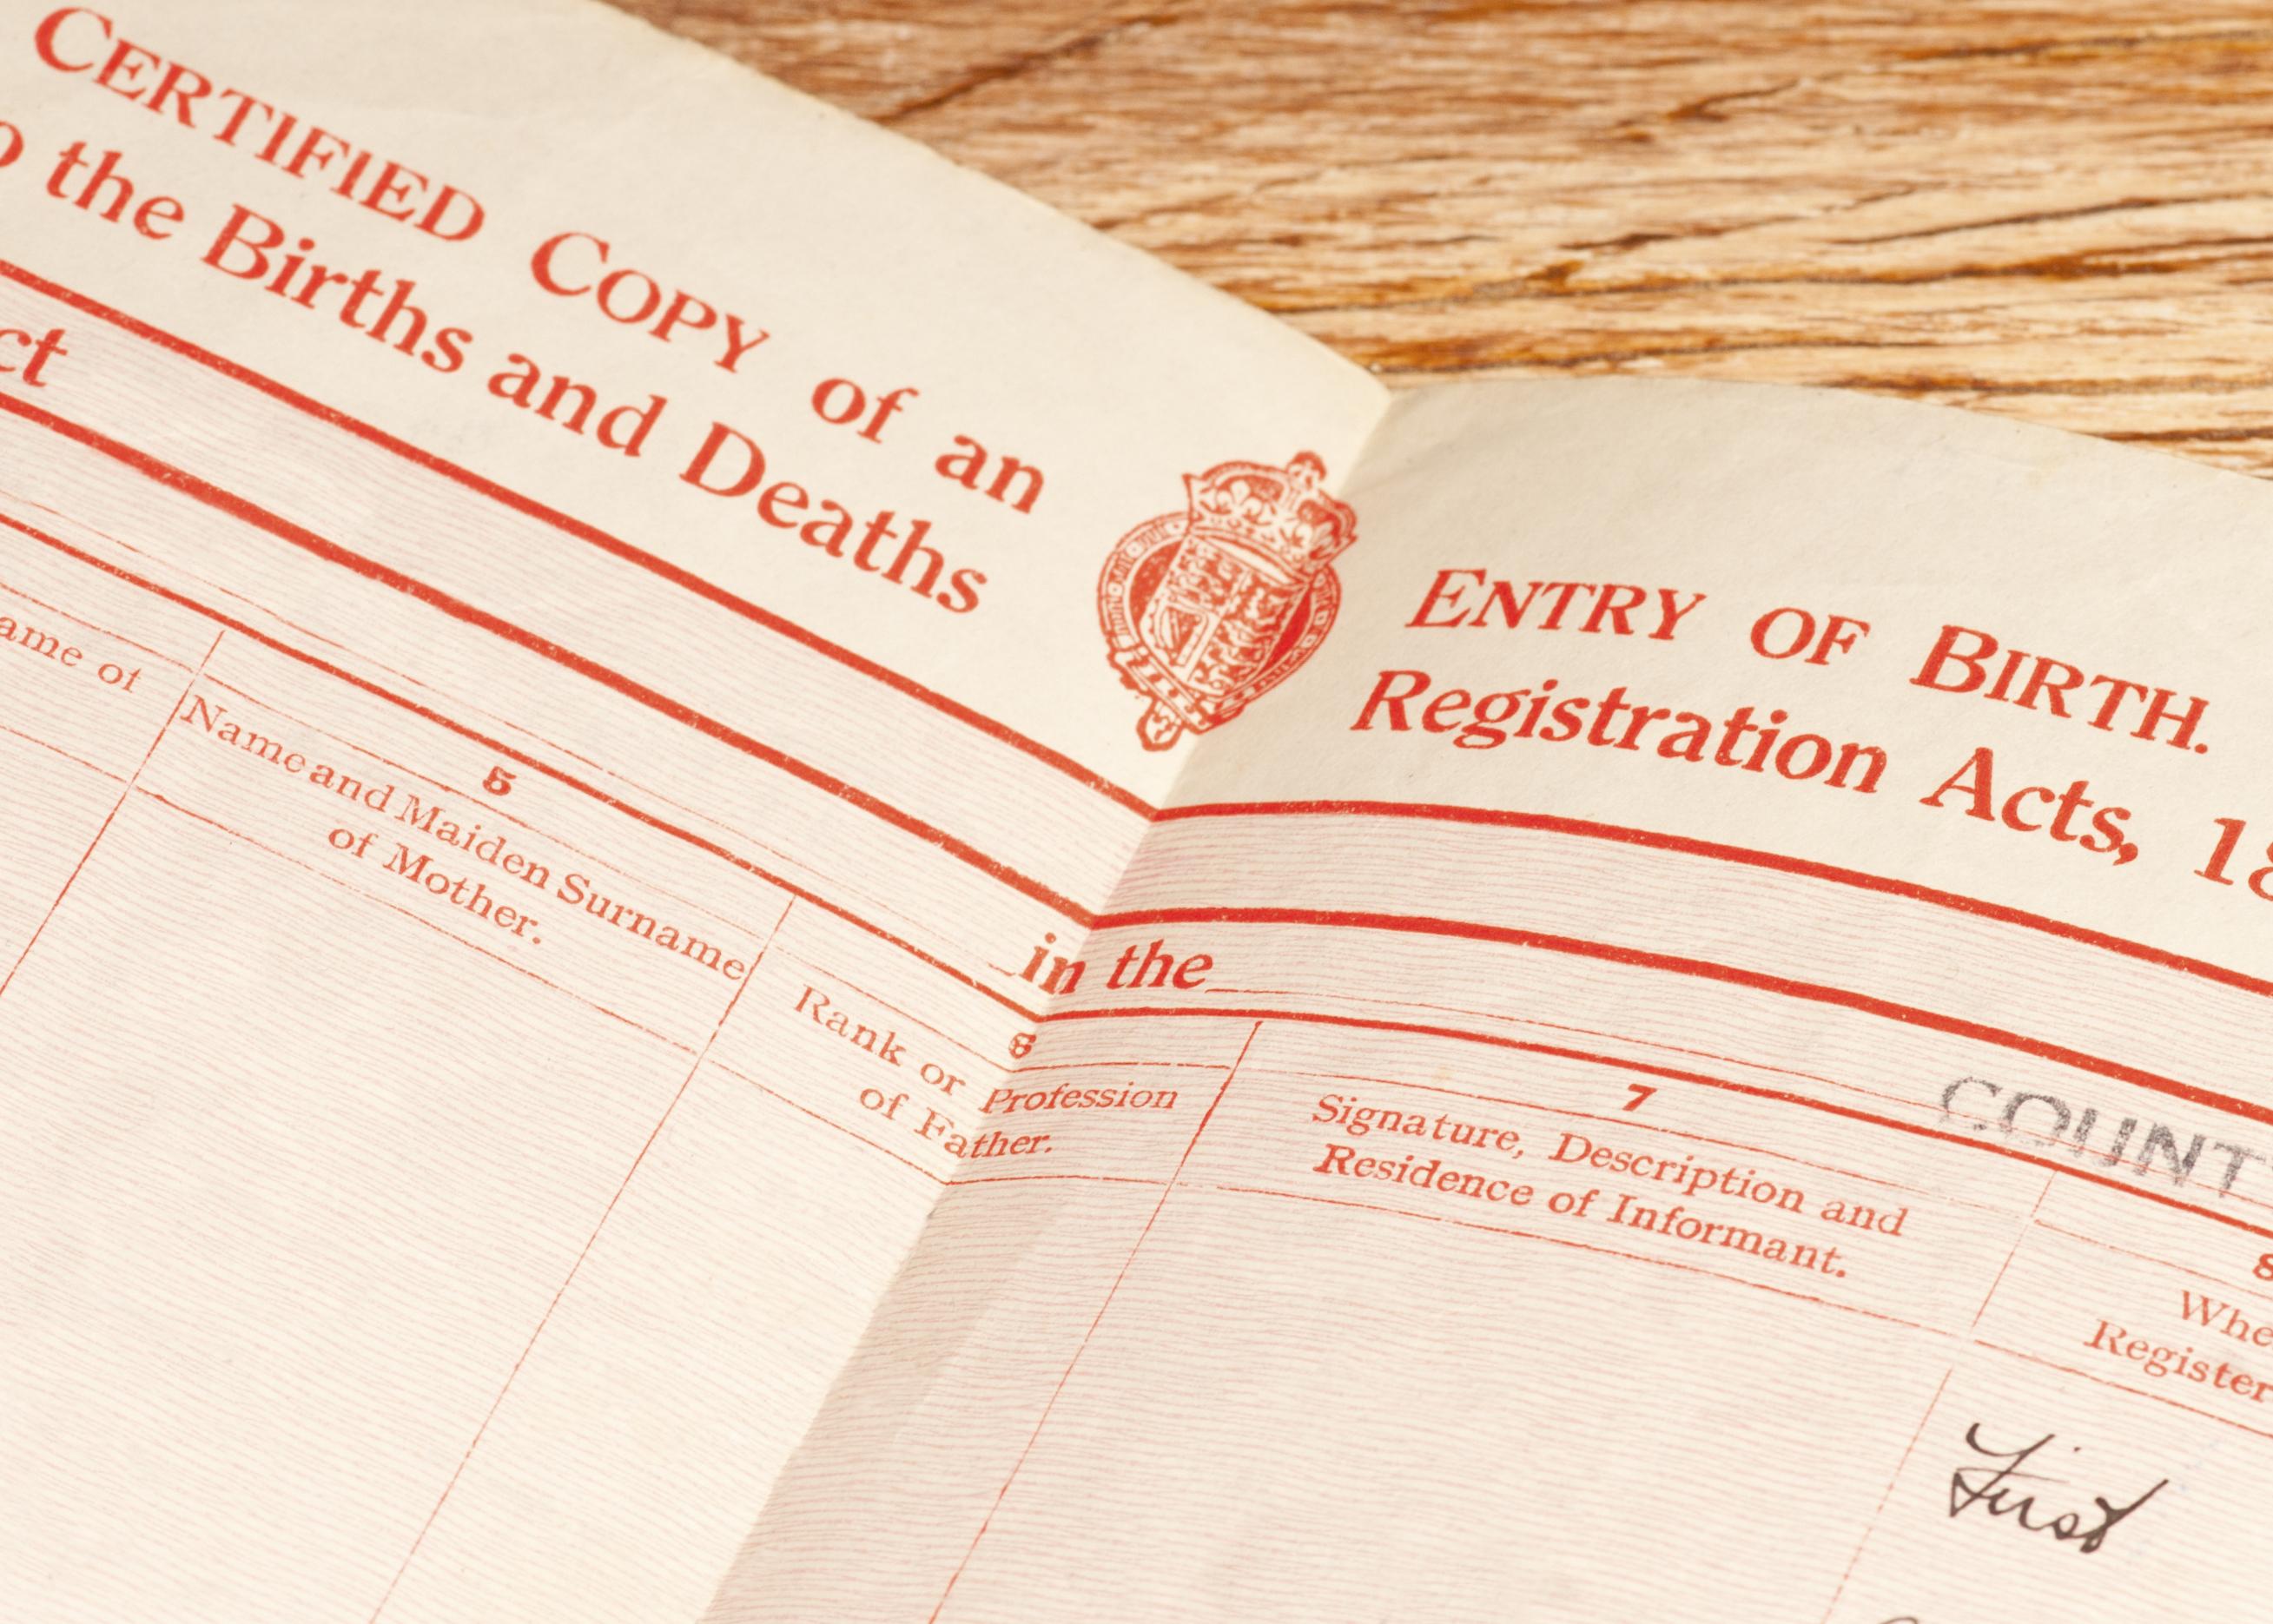 British Birth Certificate Montgomery Community Media